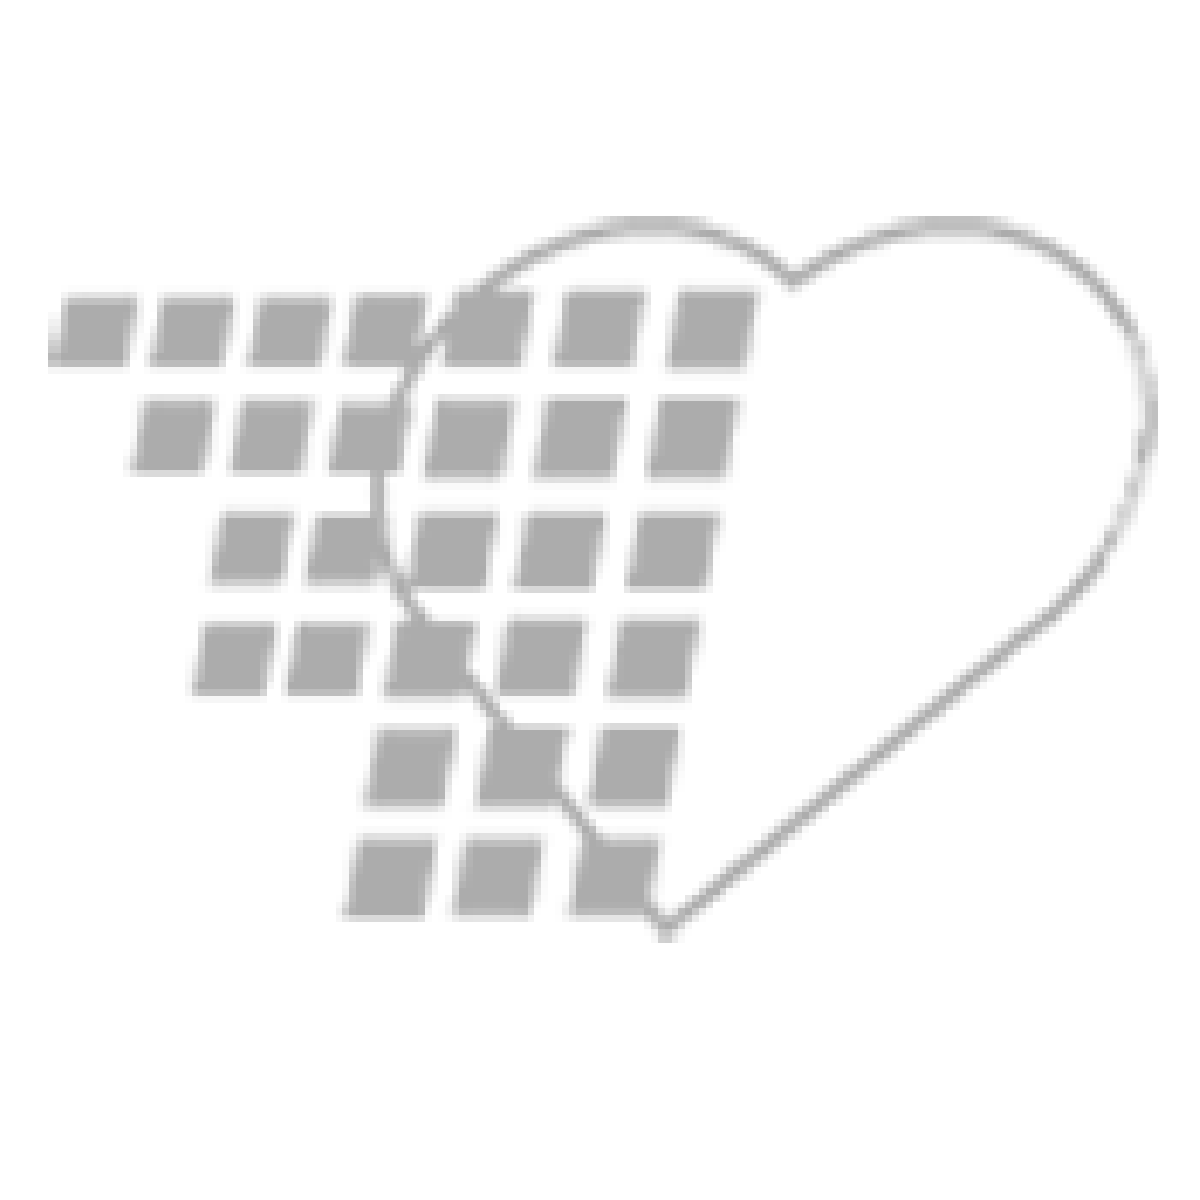 06-93-0079 - Demo Dose® Hyrdocodon APAP 5/500 mg - 1000 Pills/Jar